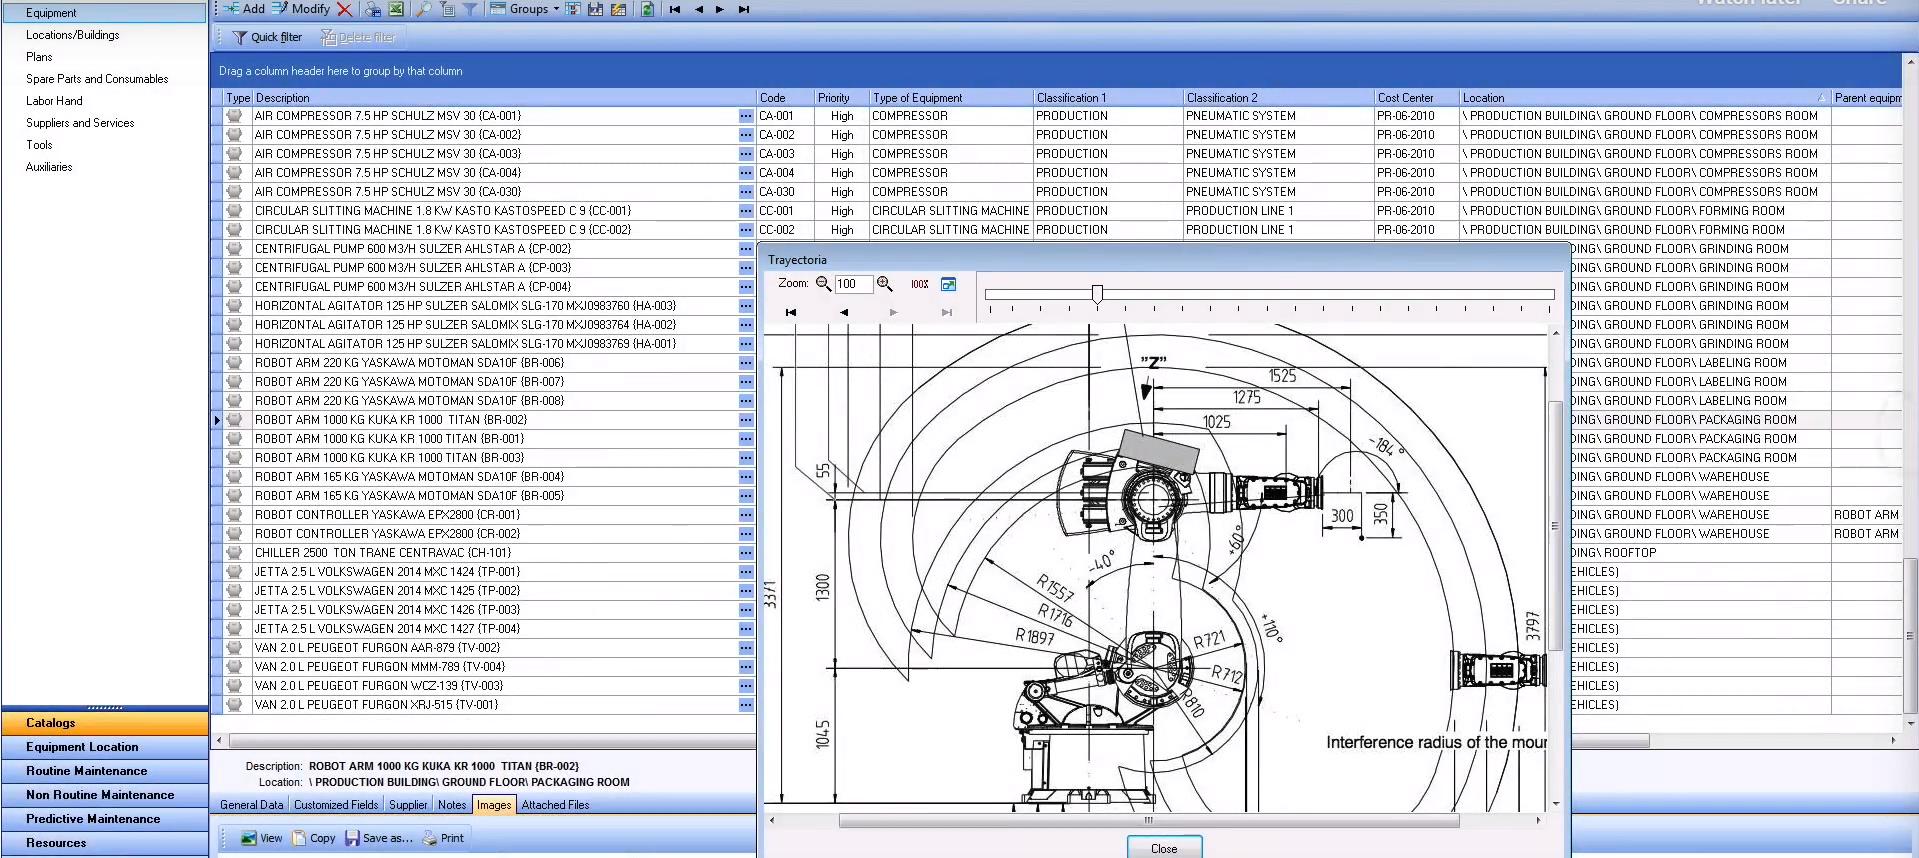 MPSoftware equipment catalogs